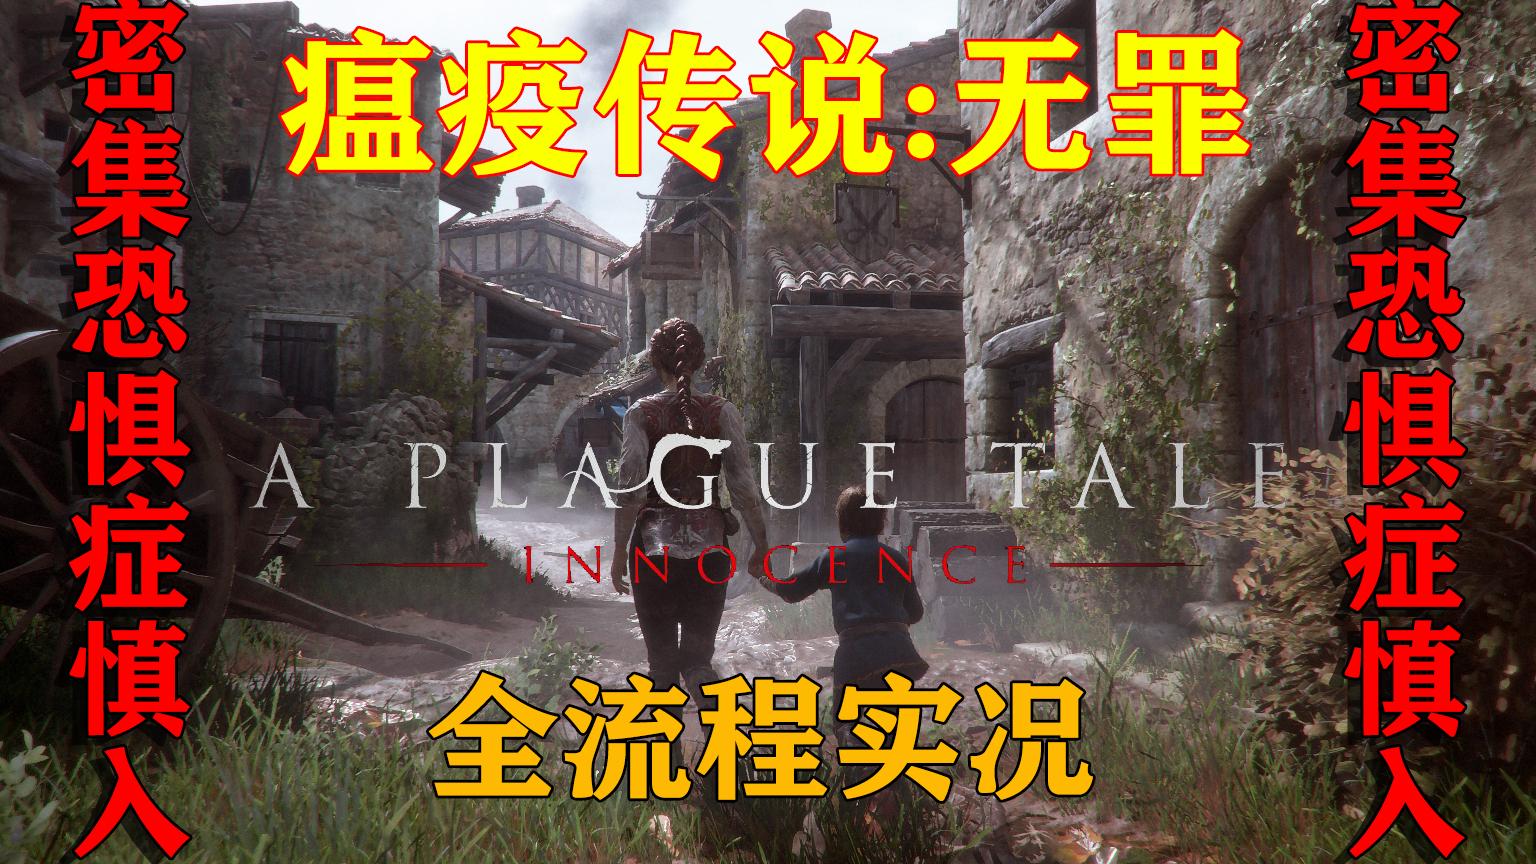 【1080P/已完结】《瘟疫传说 无罪》单人伪攻略剧情流程解说